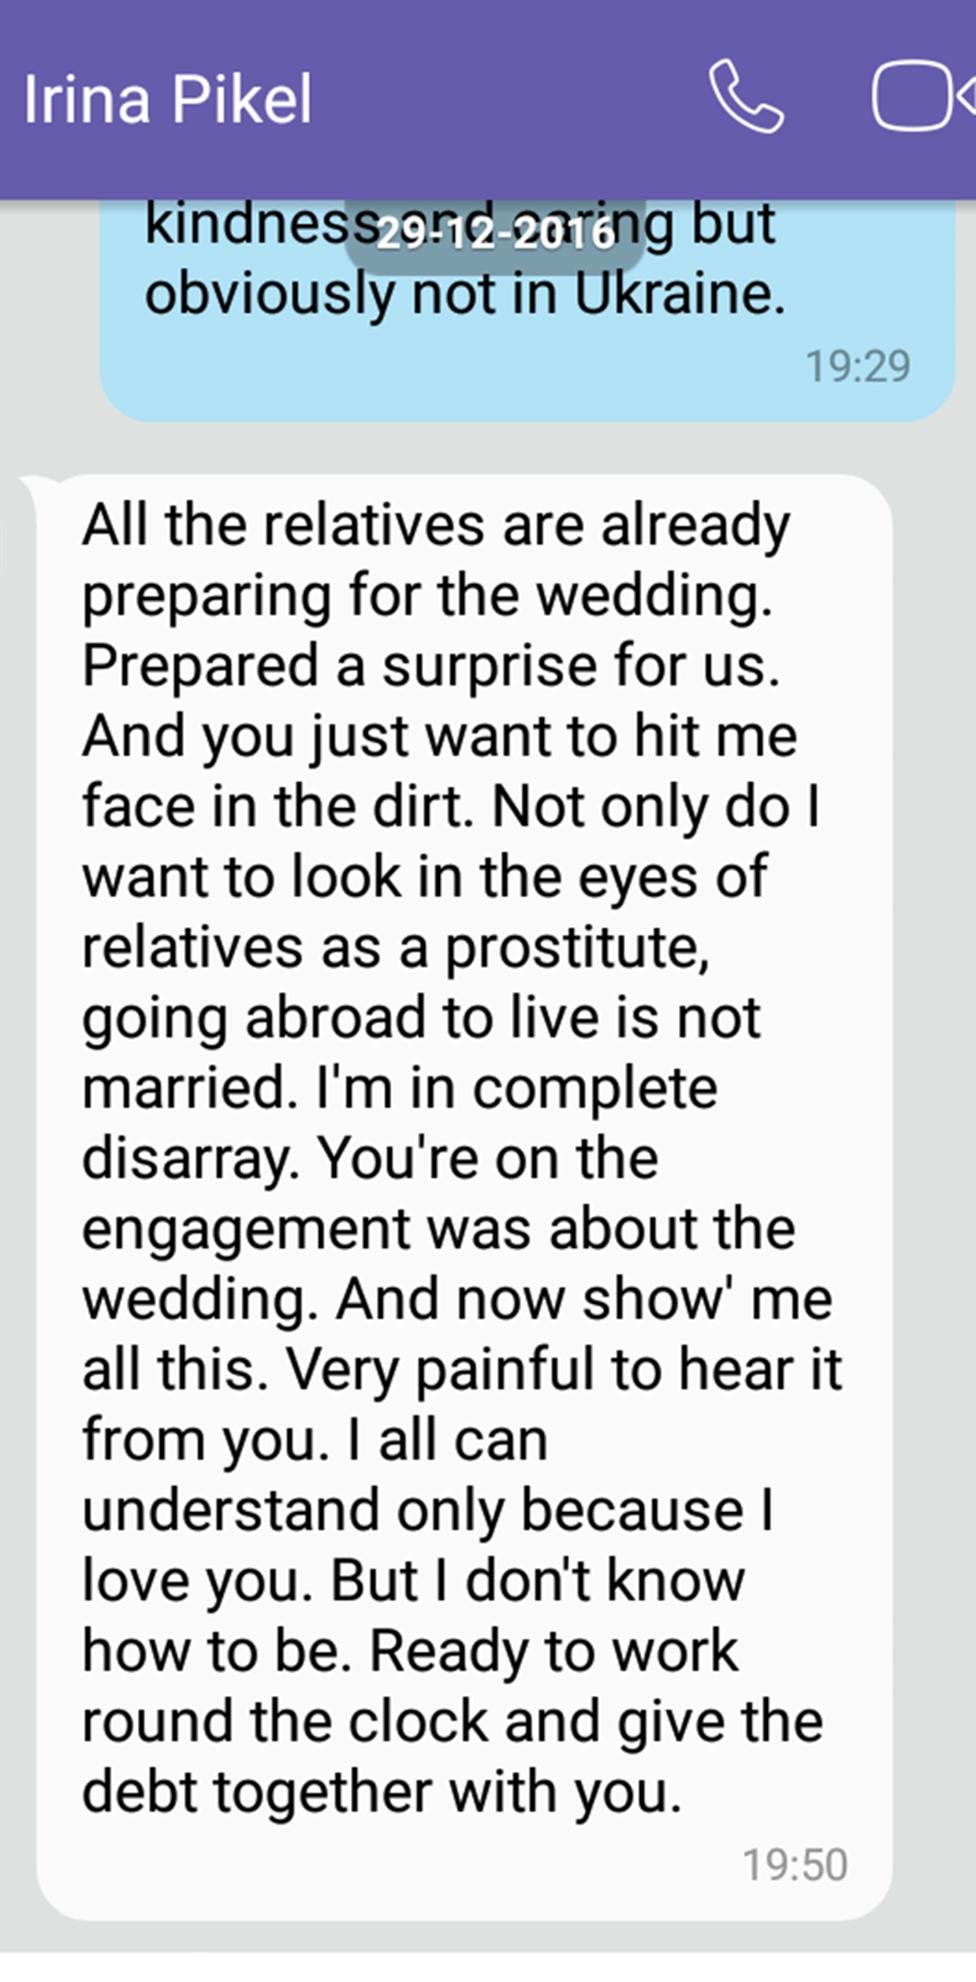 Un mensaje de Irina a James